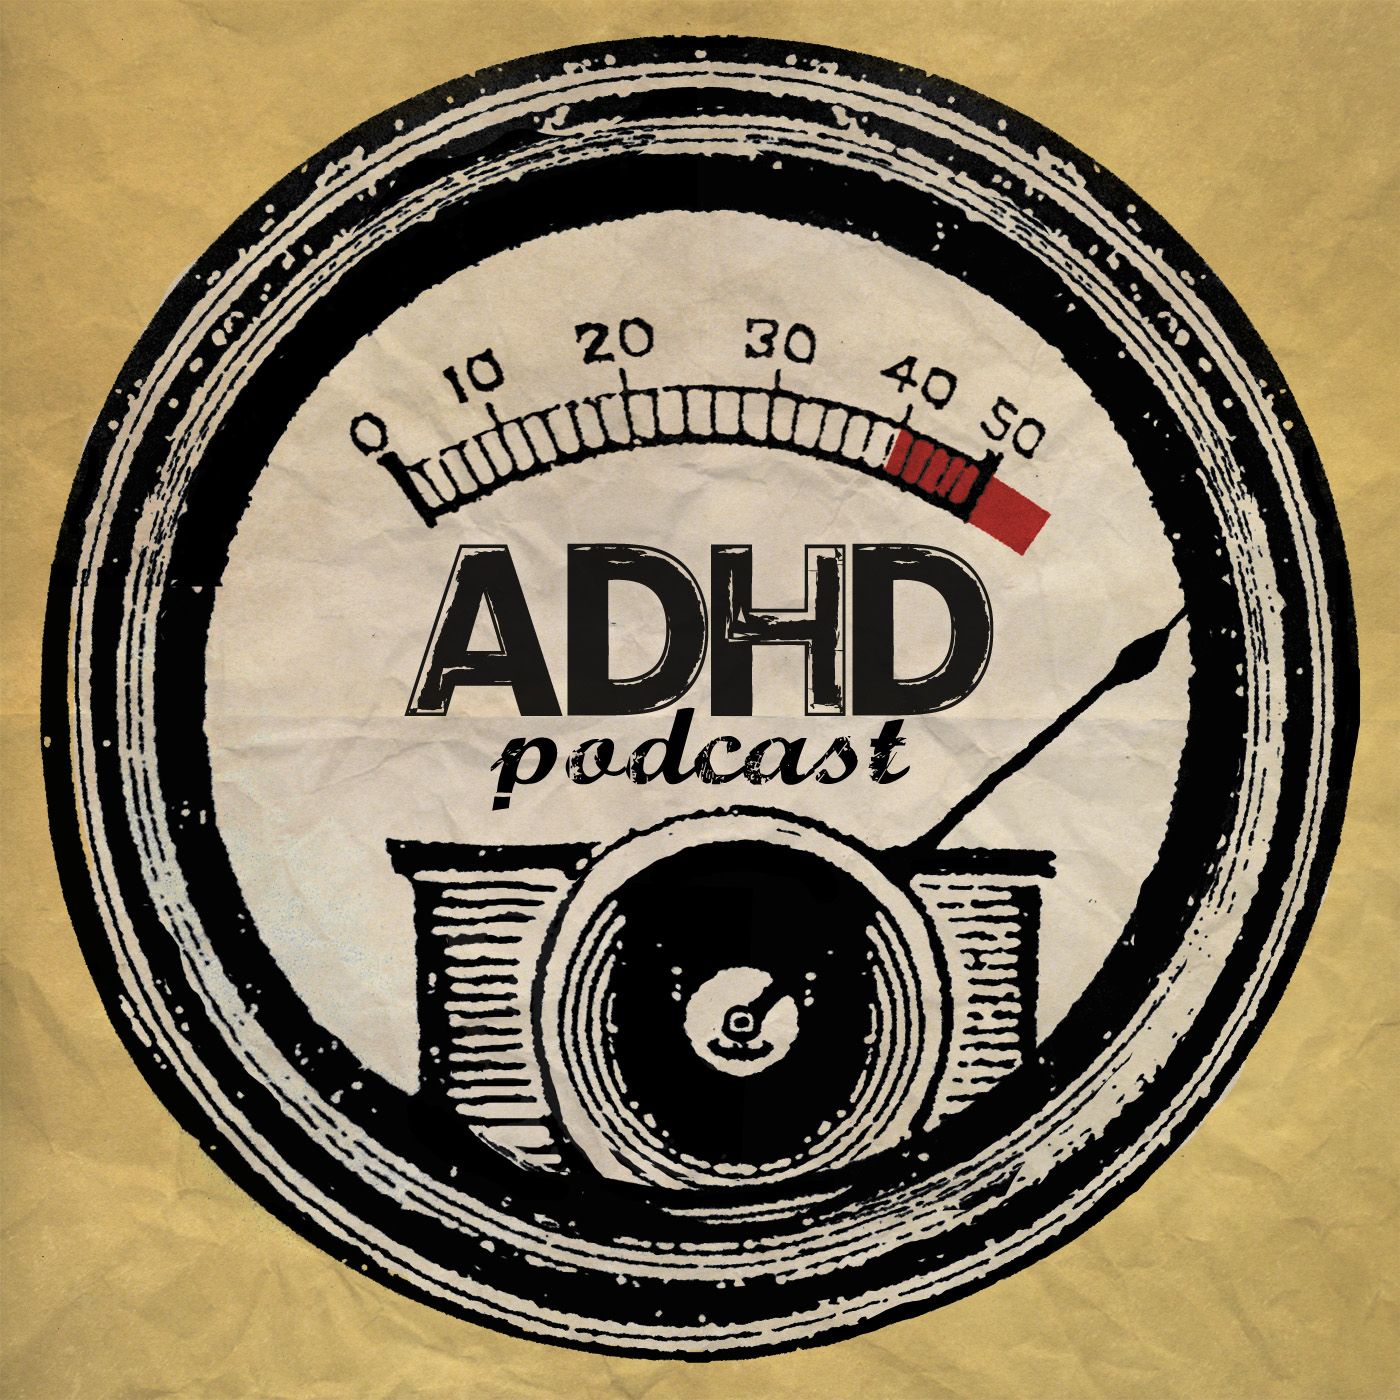 ADHDcast show art